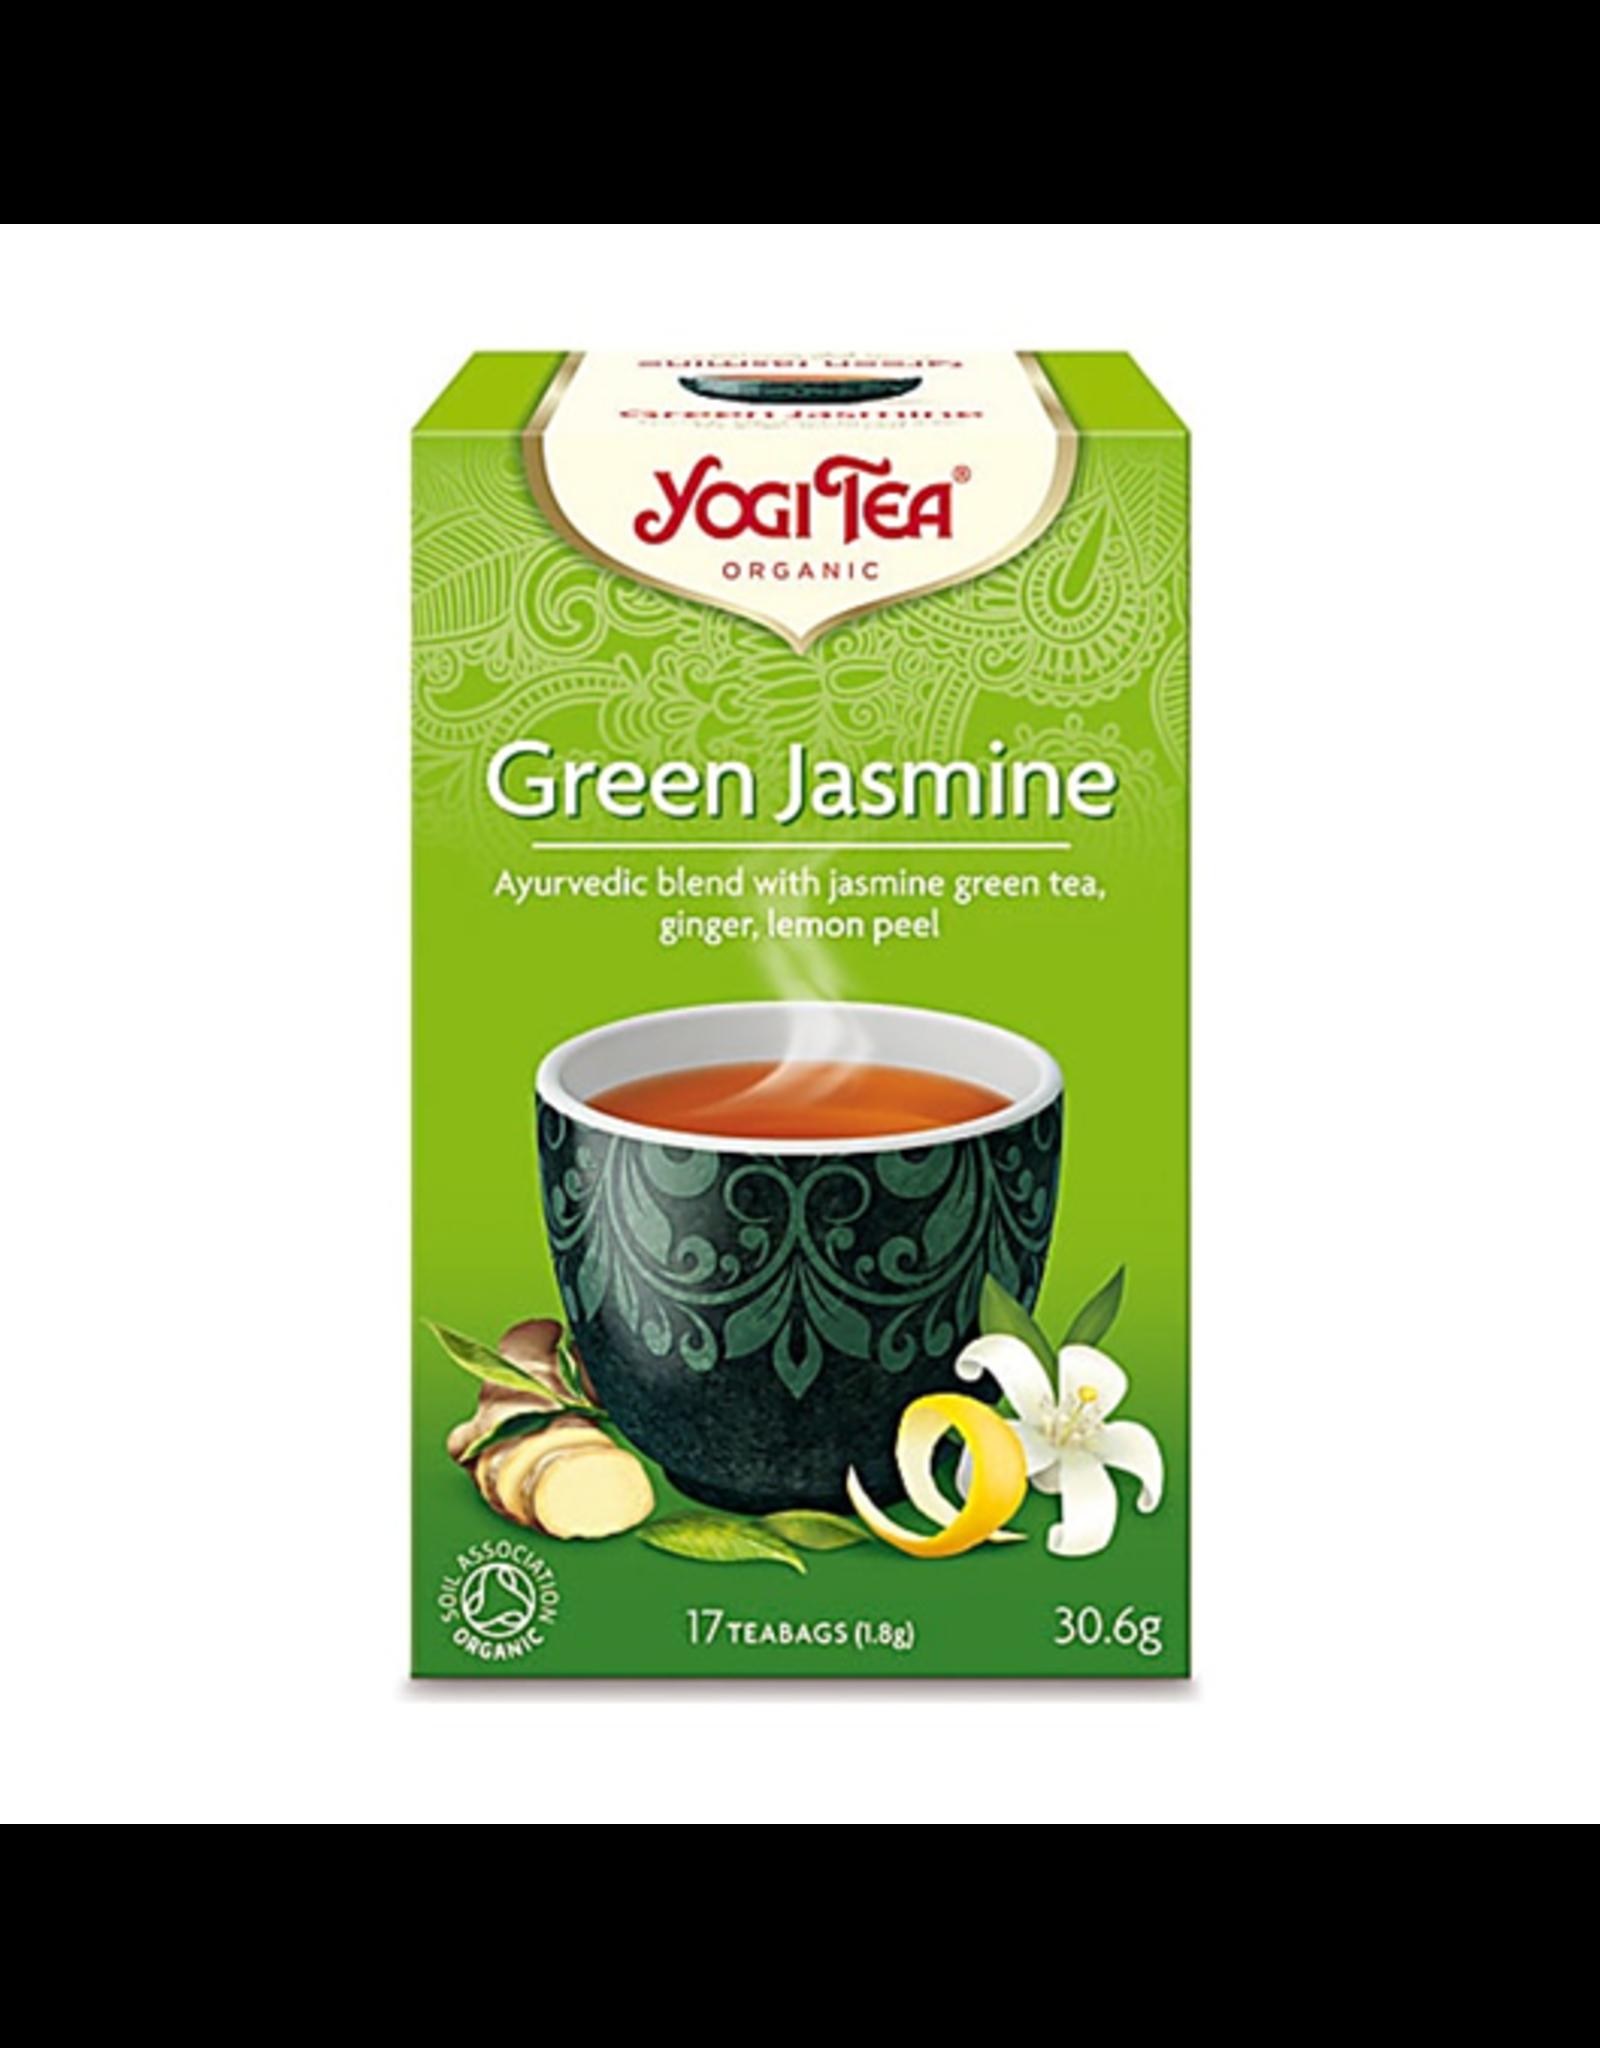 Yogi Tea Green Jasmine